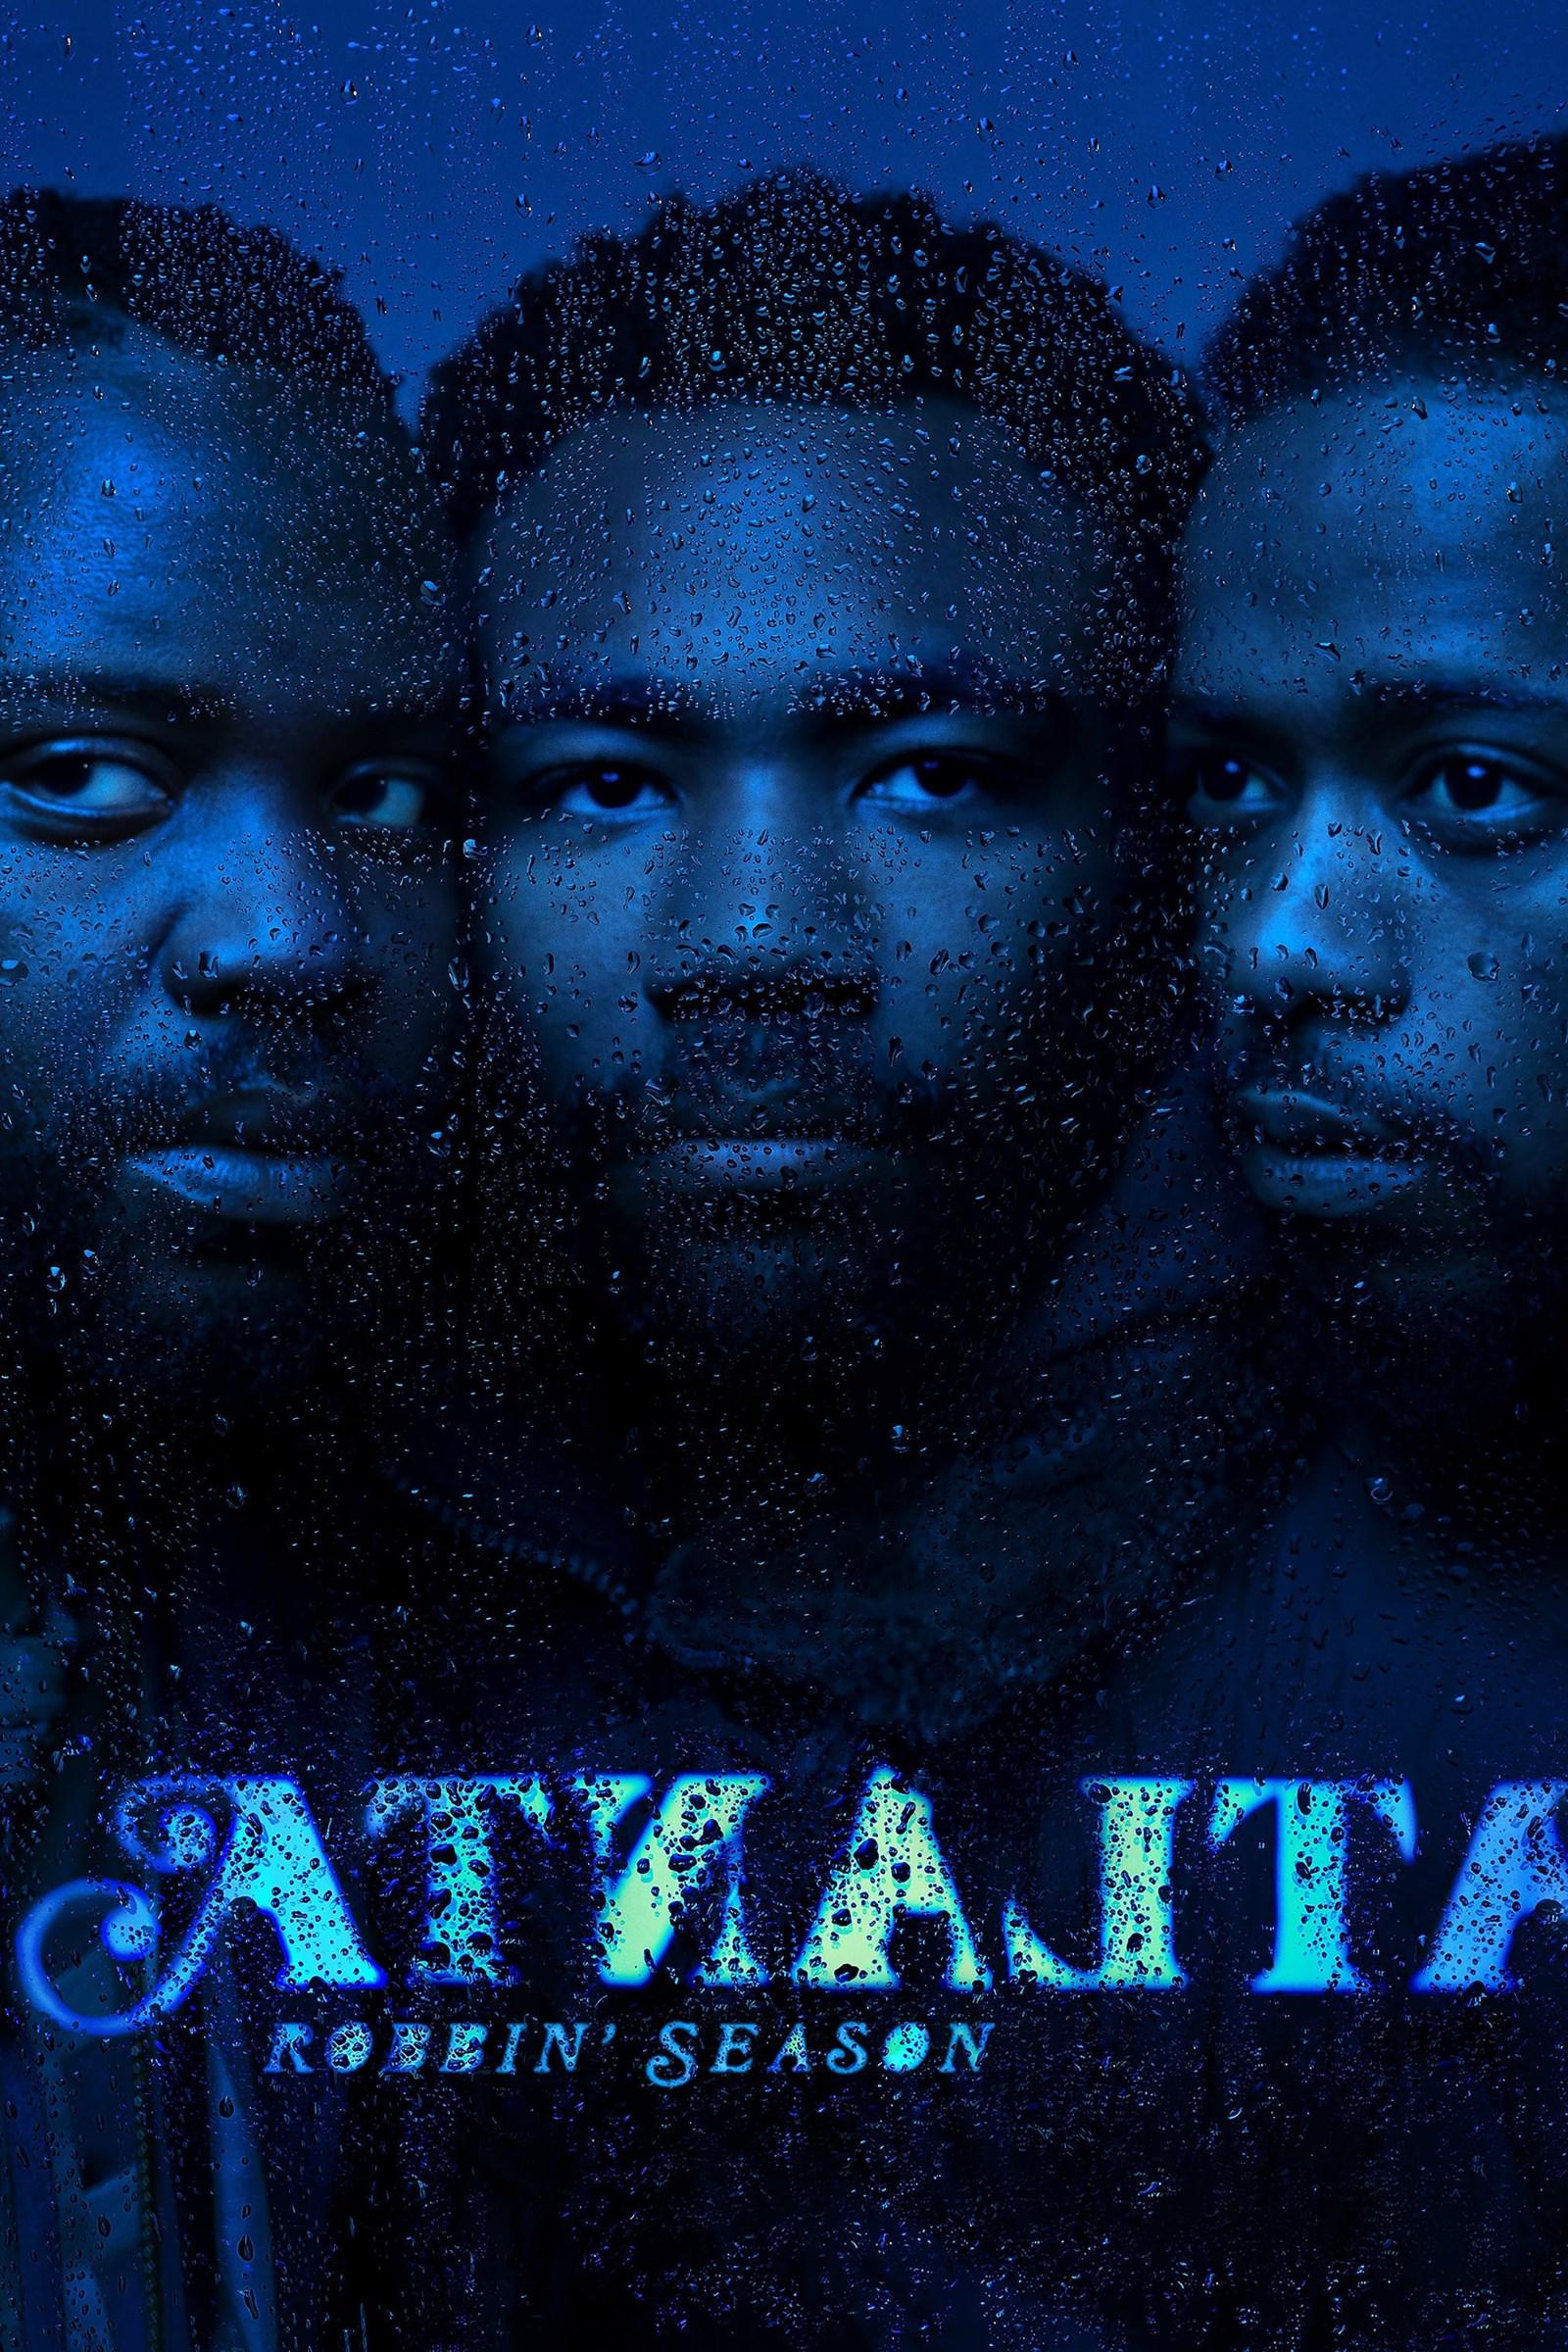 Subscene - Atlanta - Second Season English hearing impaired subtitle